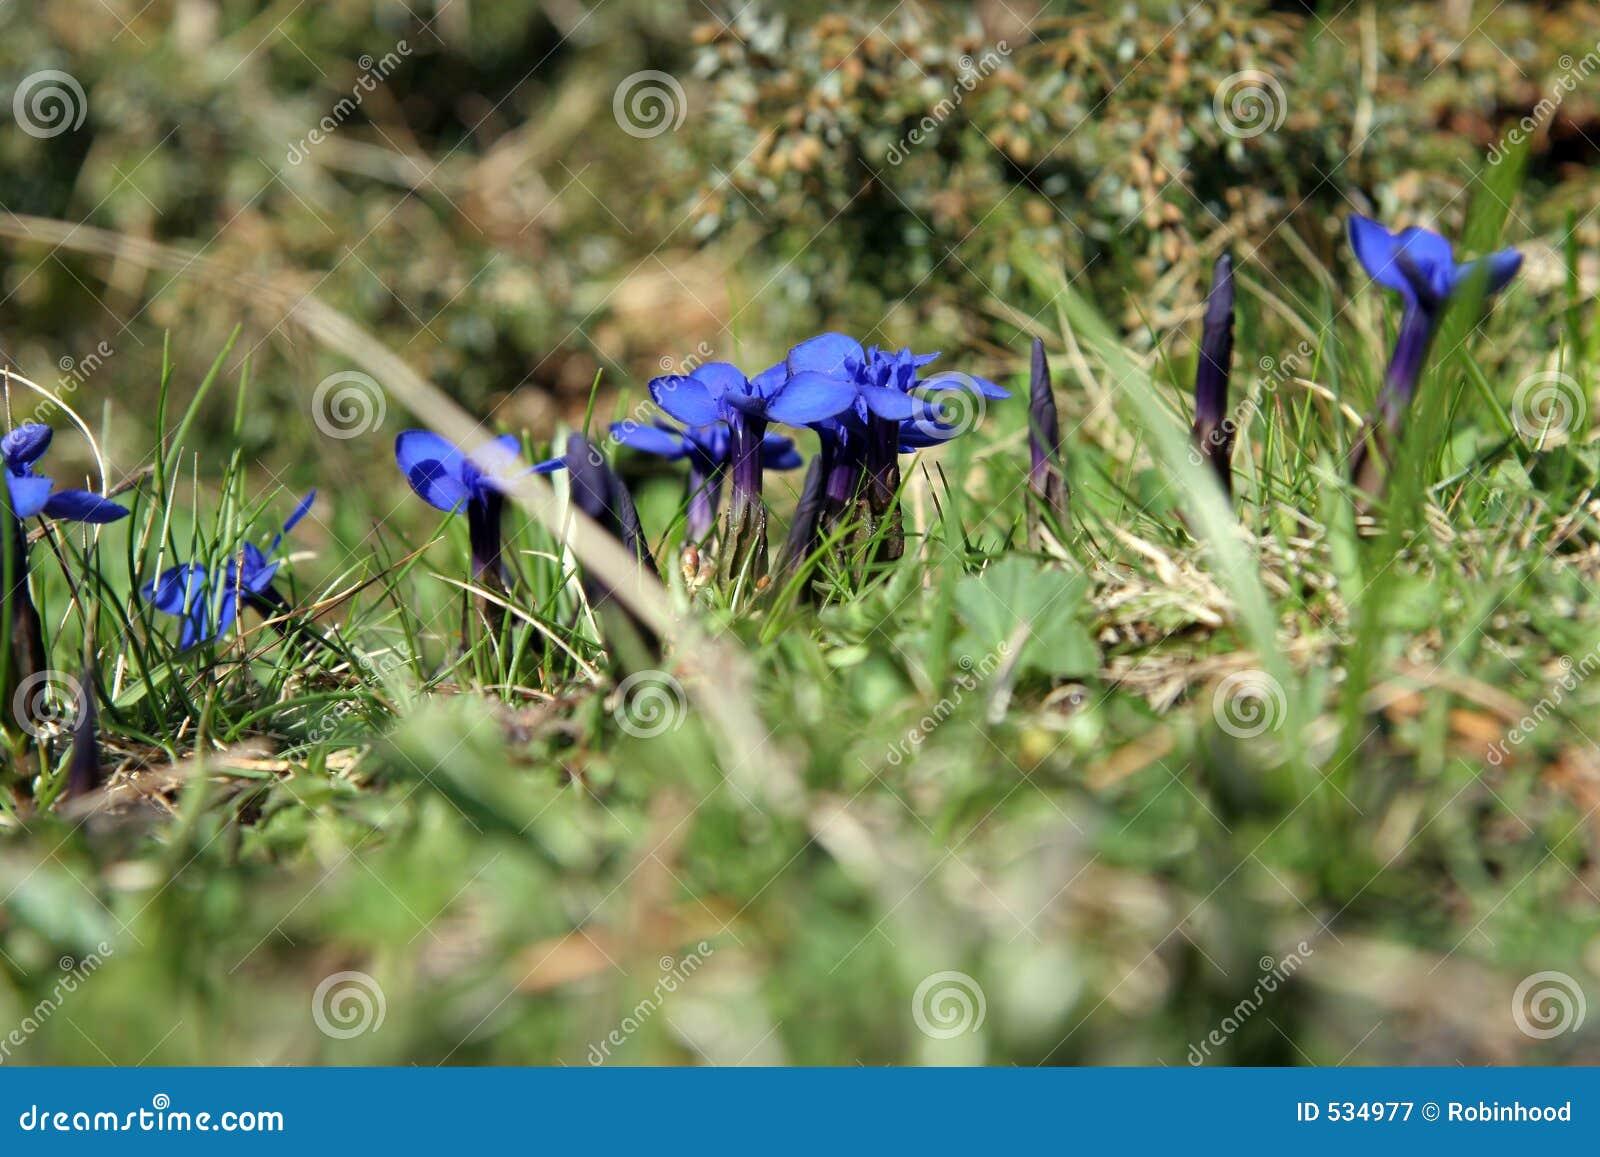 Download 蓝色开花植物 库存图片. 图片 包括有 卖花人, 花蜜, 生活, 庭院, 东部, 国家(地区), 春天, browne - 534977